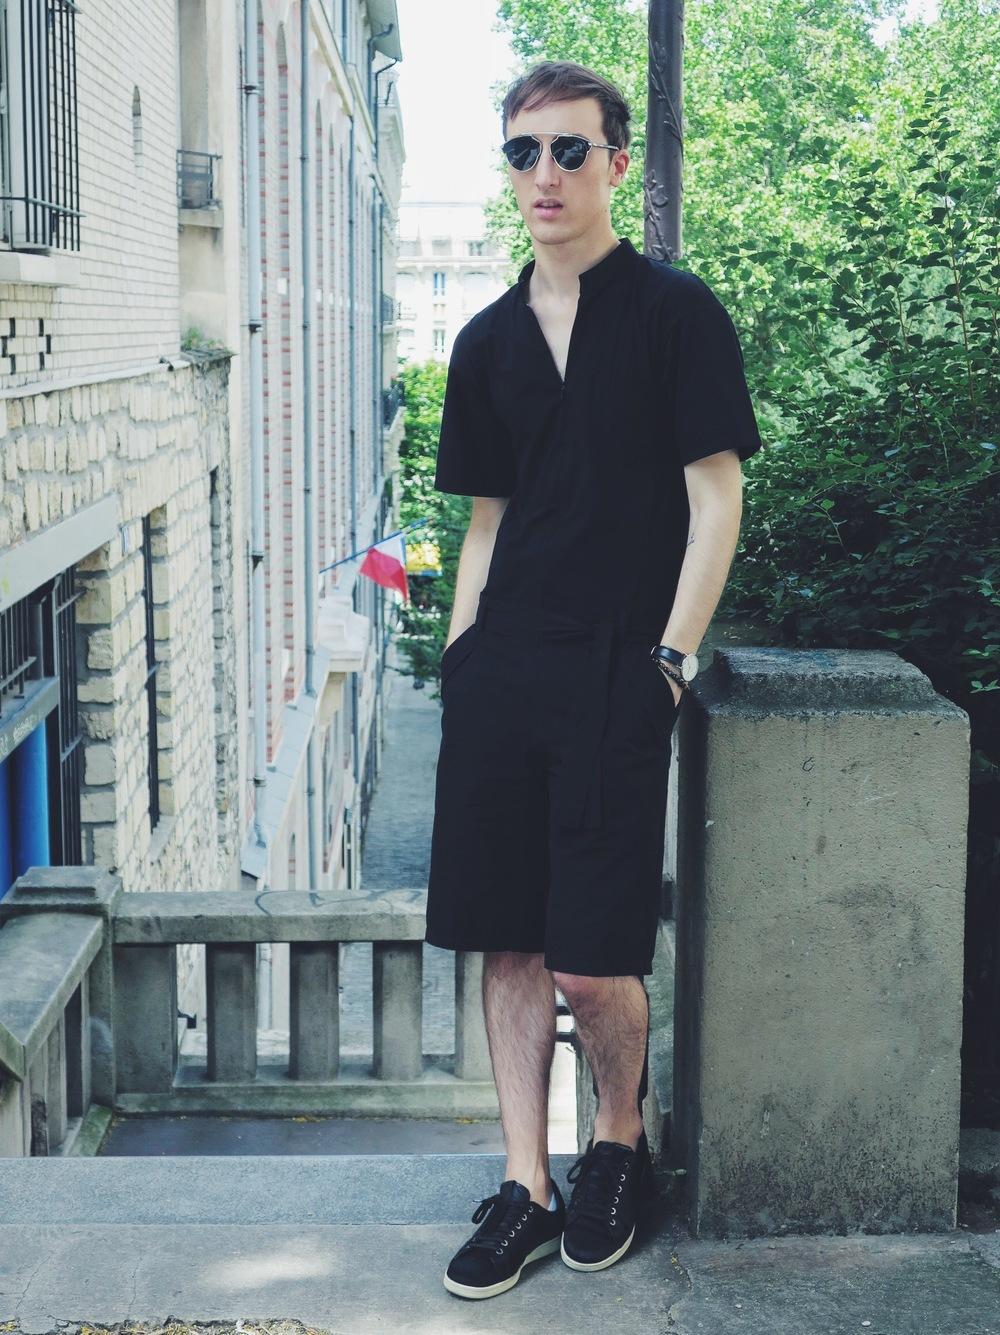 Zara jumpsuit - Maruti sneakers - Wavvse sunglasses